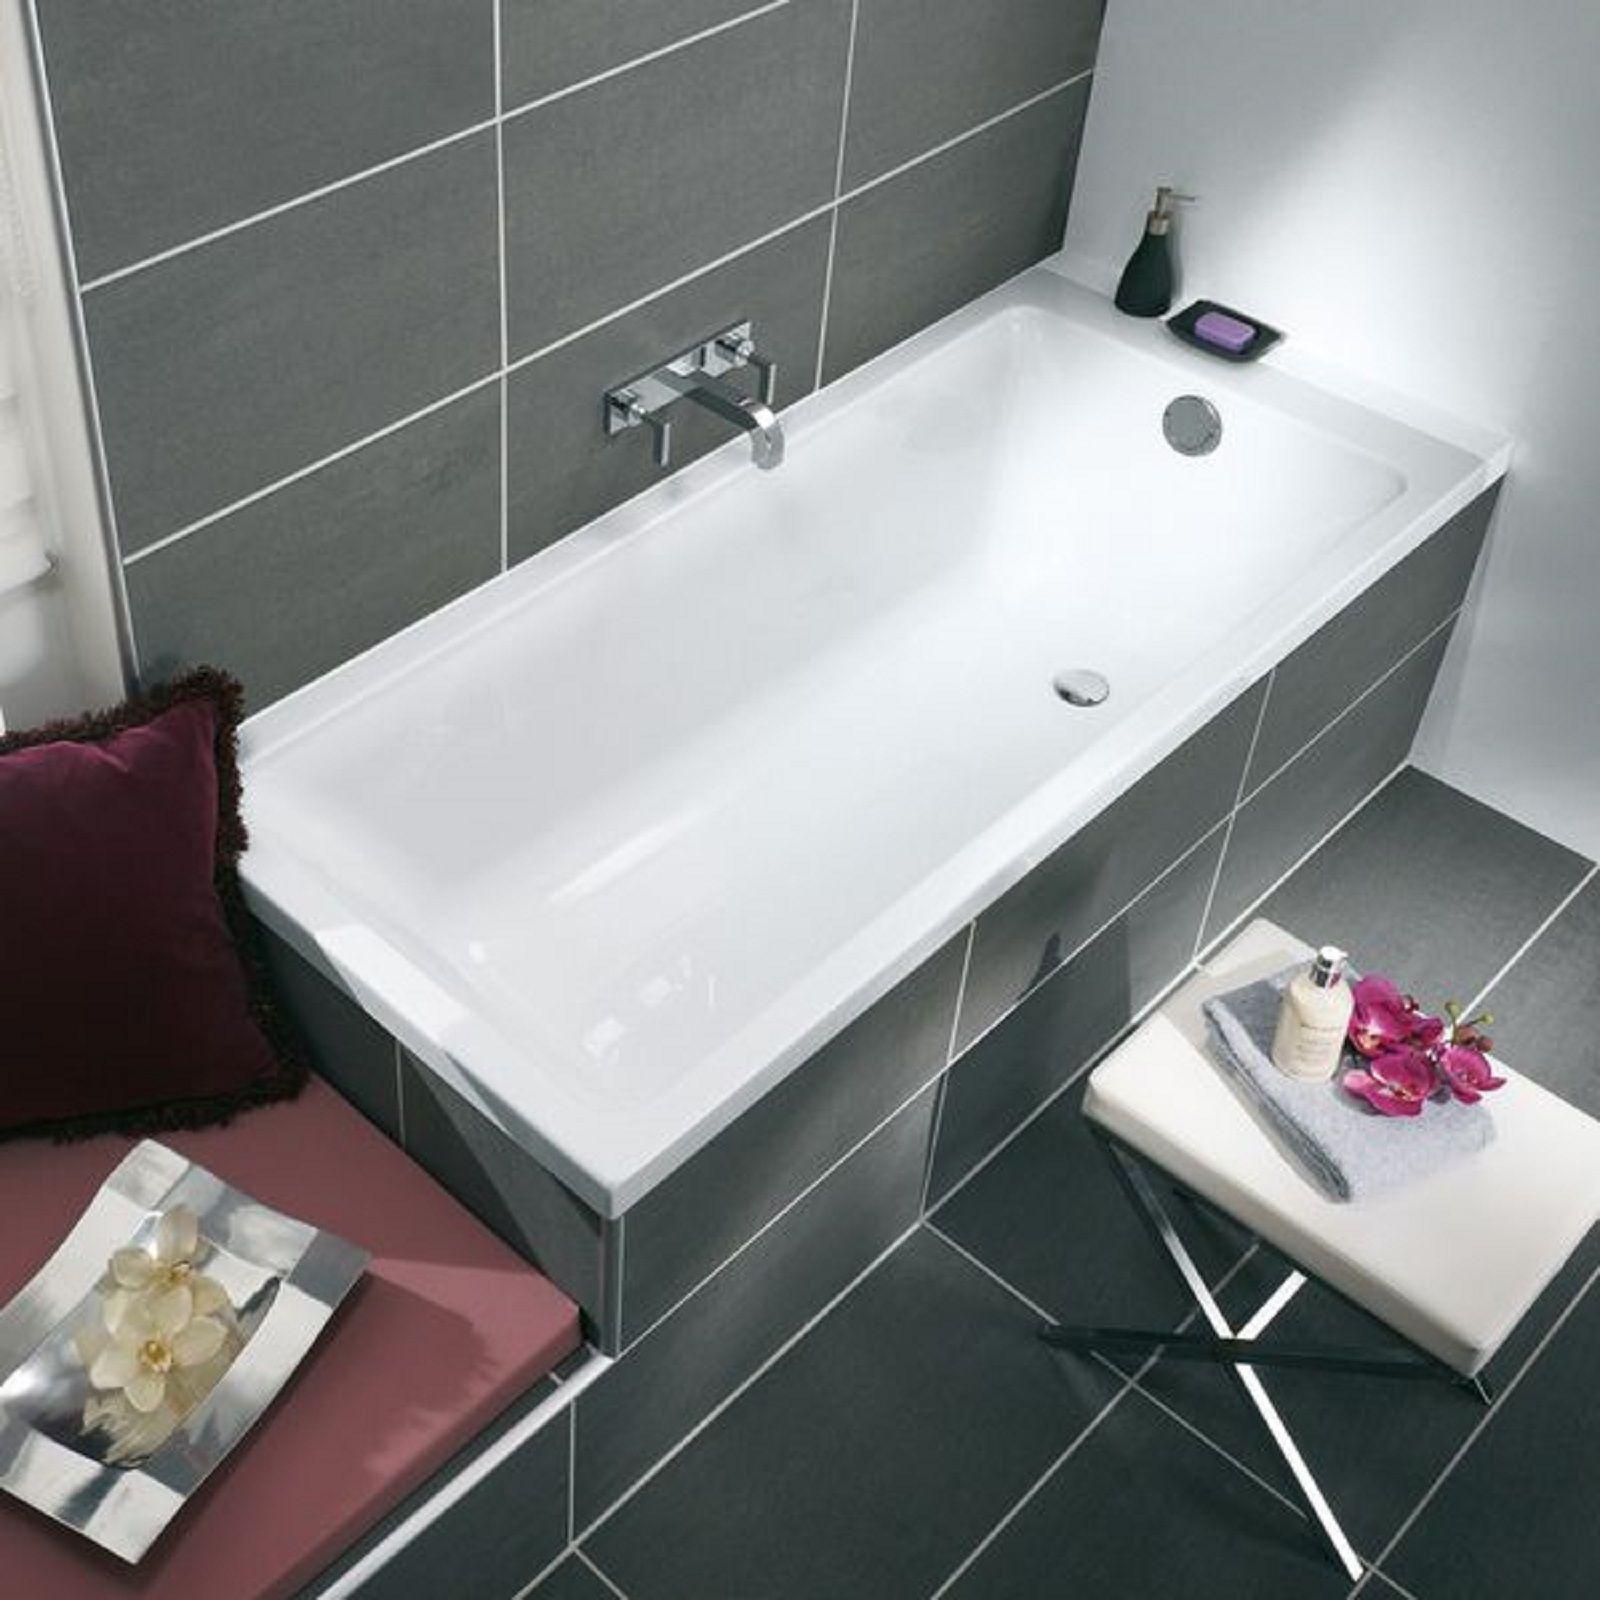 Vasca Da Bagno Misure Standard vasche di misura standard | vasca, idee vasca da bagno